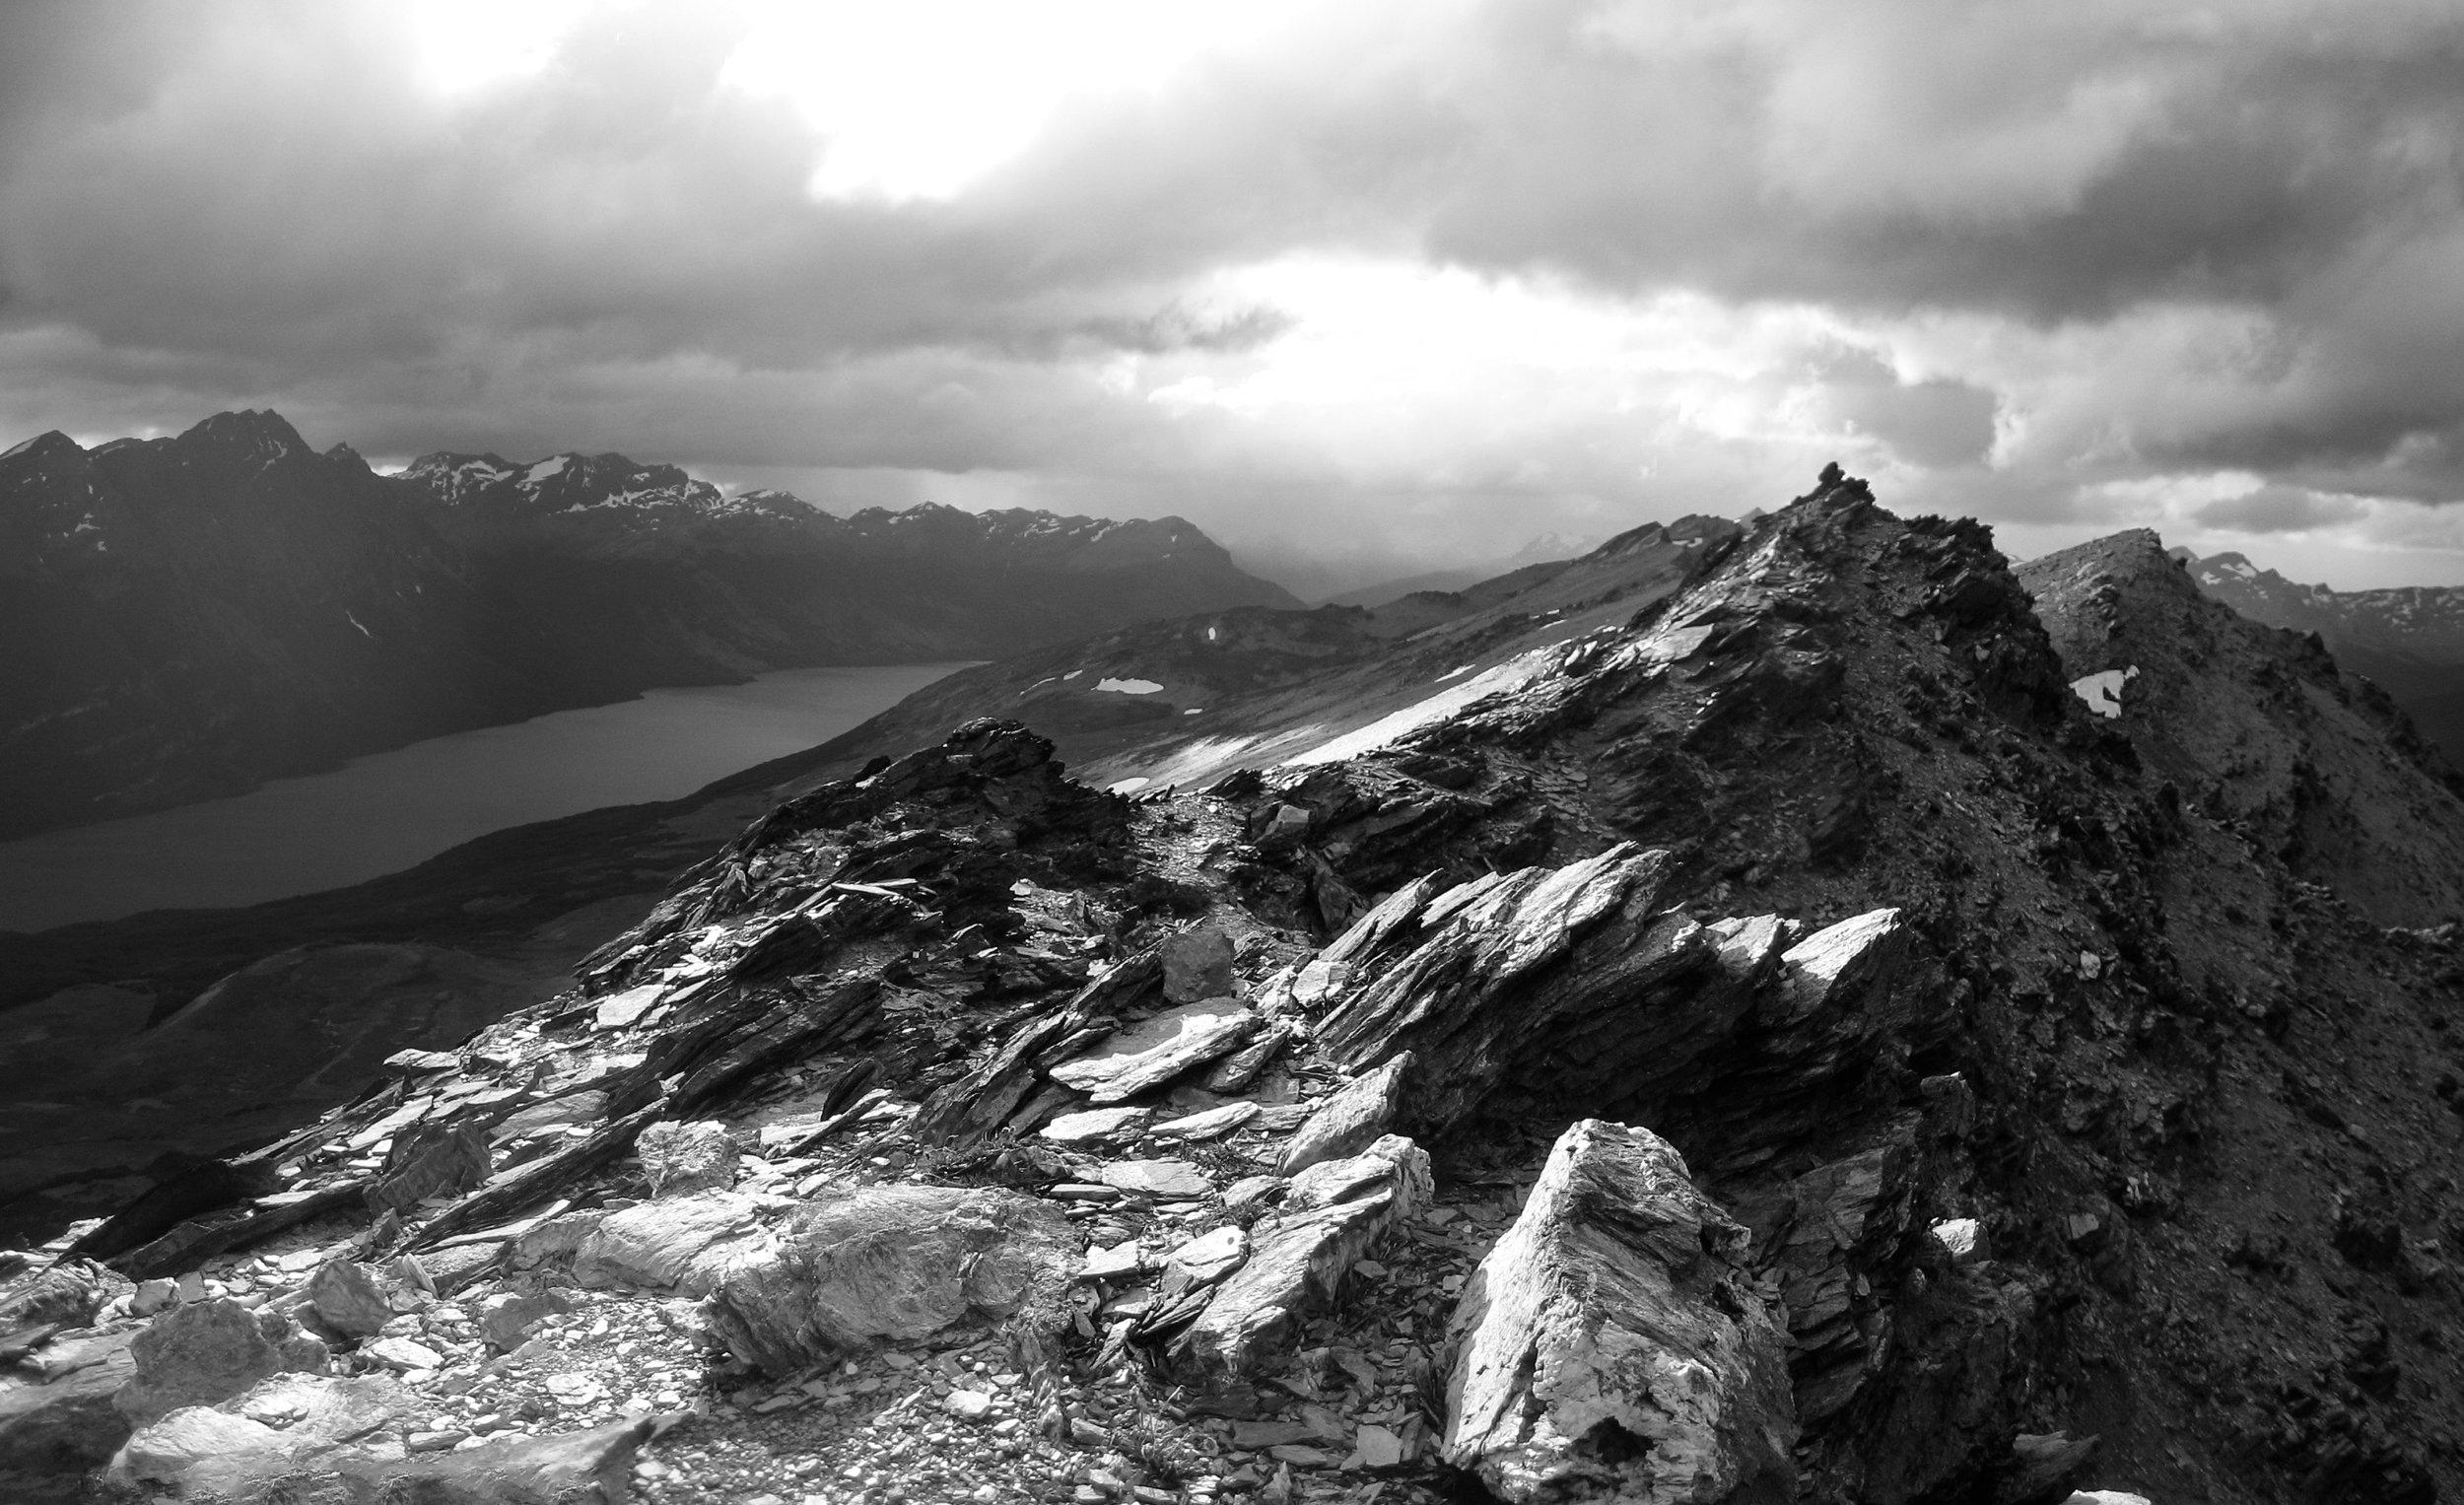 tierra-del-fuego_ushuaia_parque-nacional_day1-5098-9--bw_jagged-rocky-ridge.jpg